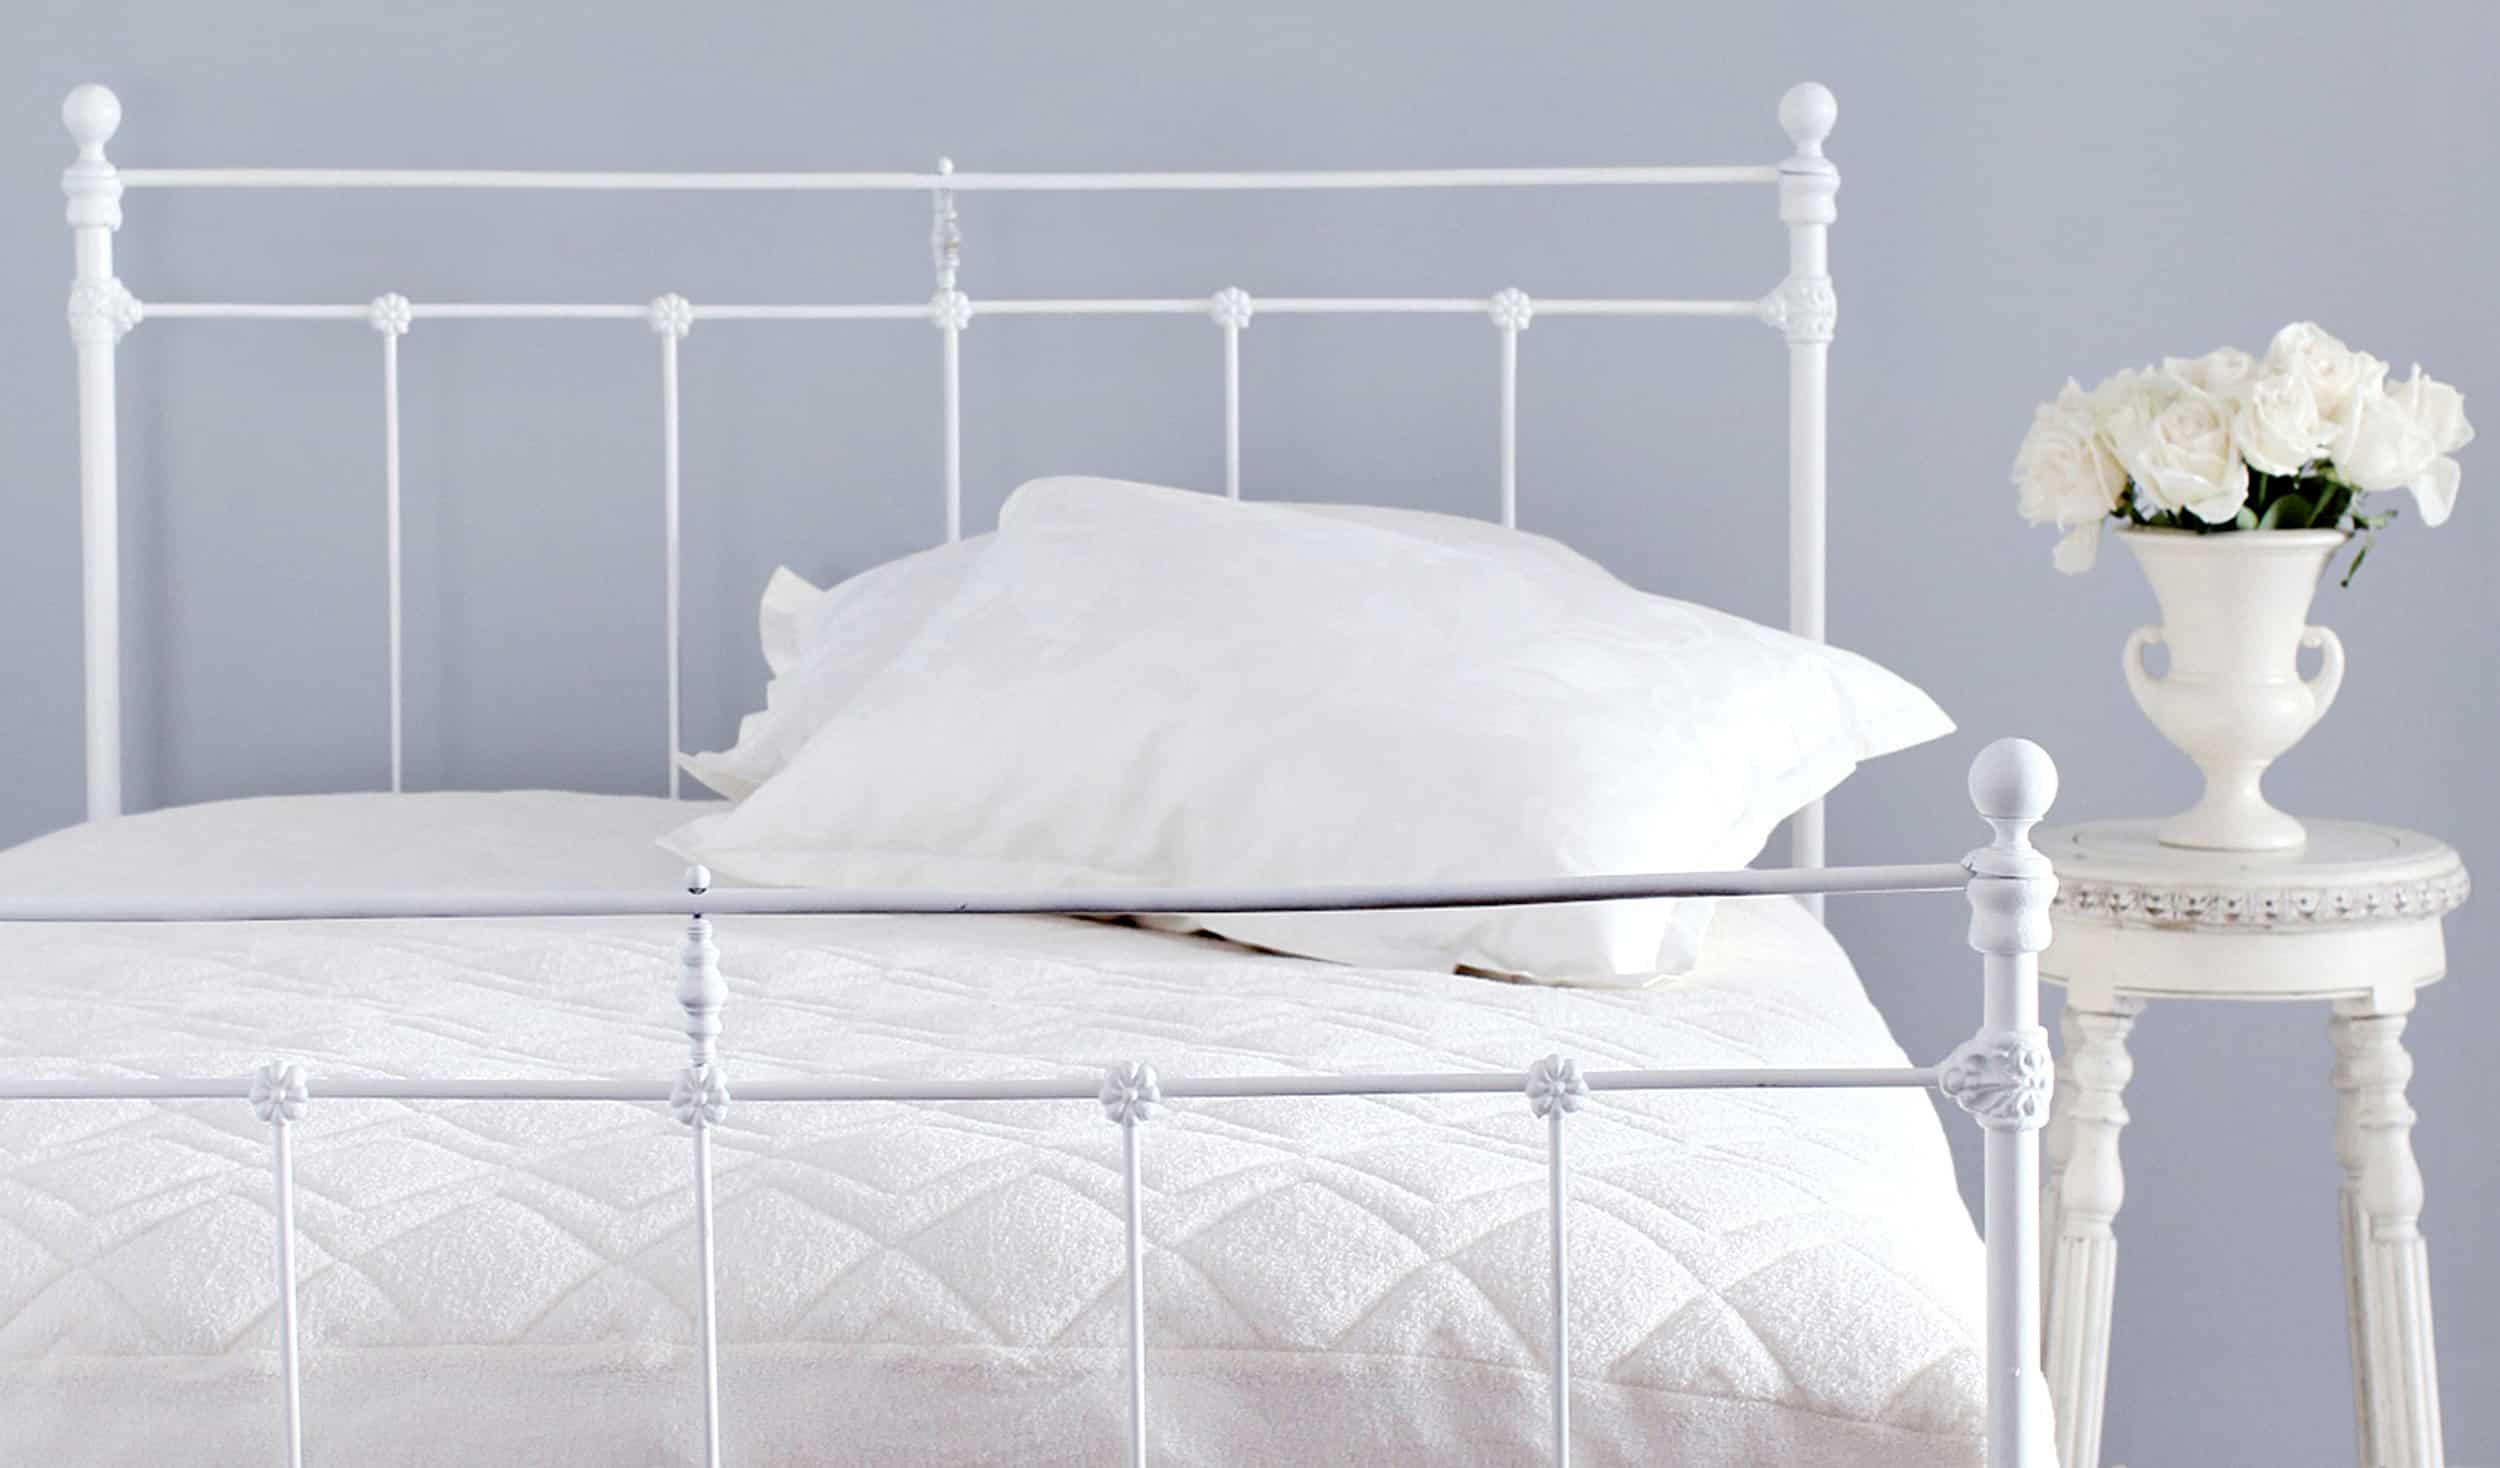 sdt dormeir 2